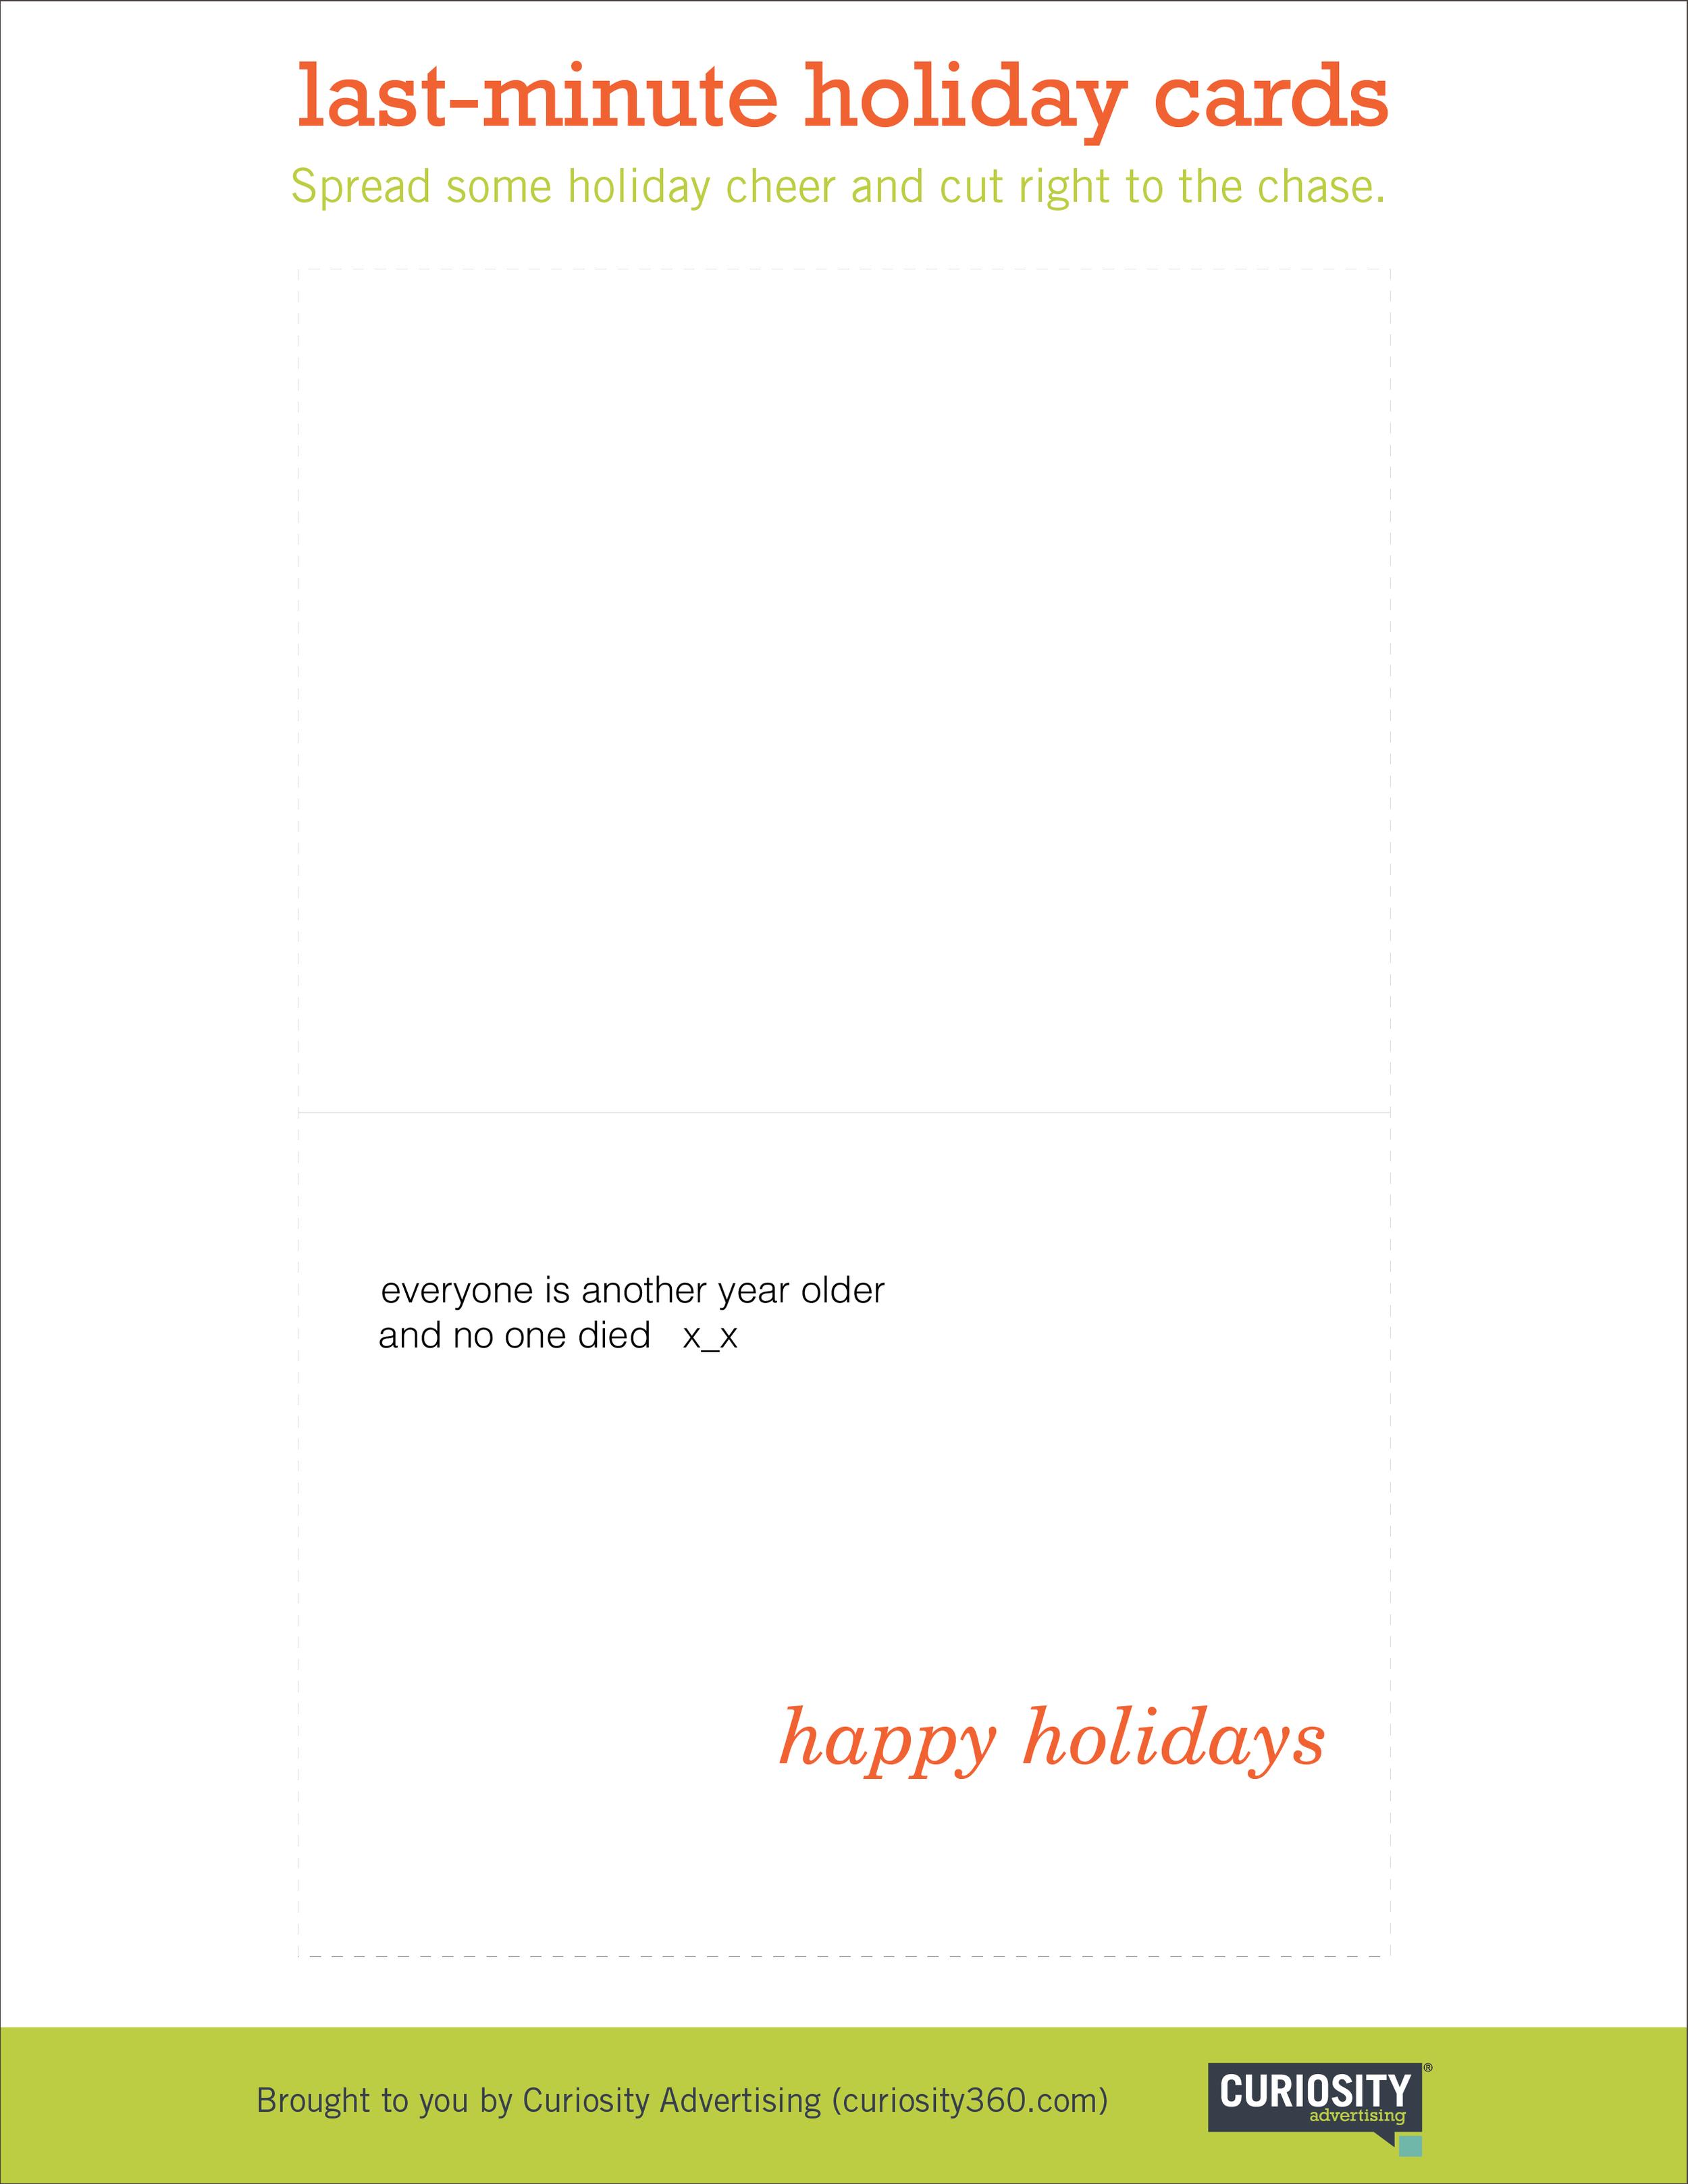 MariaBee_CuriosityHoliday_Card4 copy.png